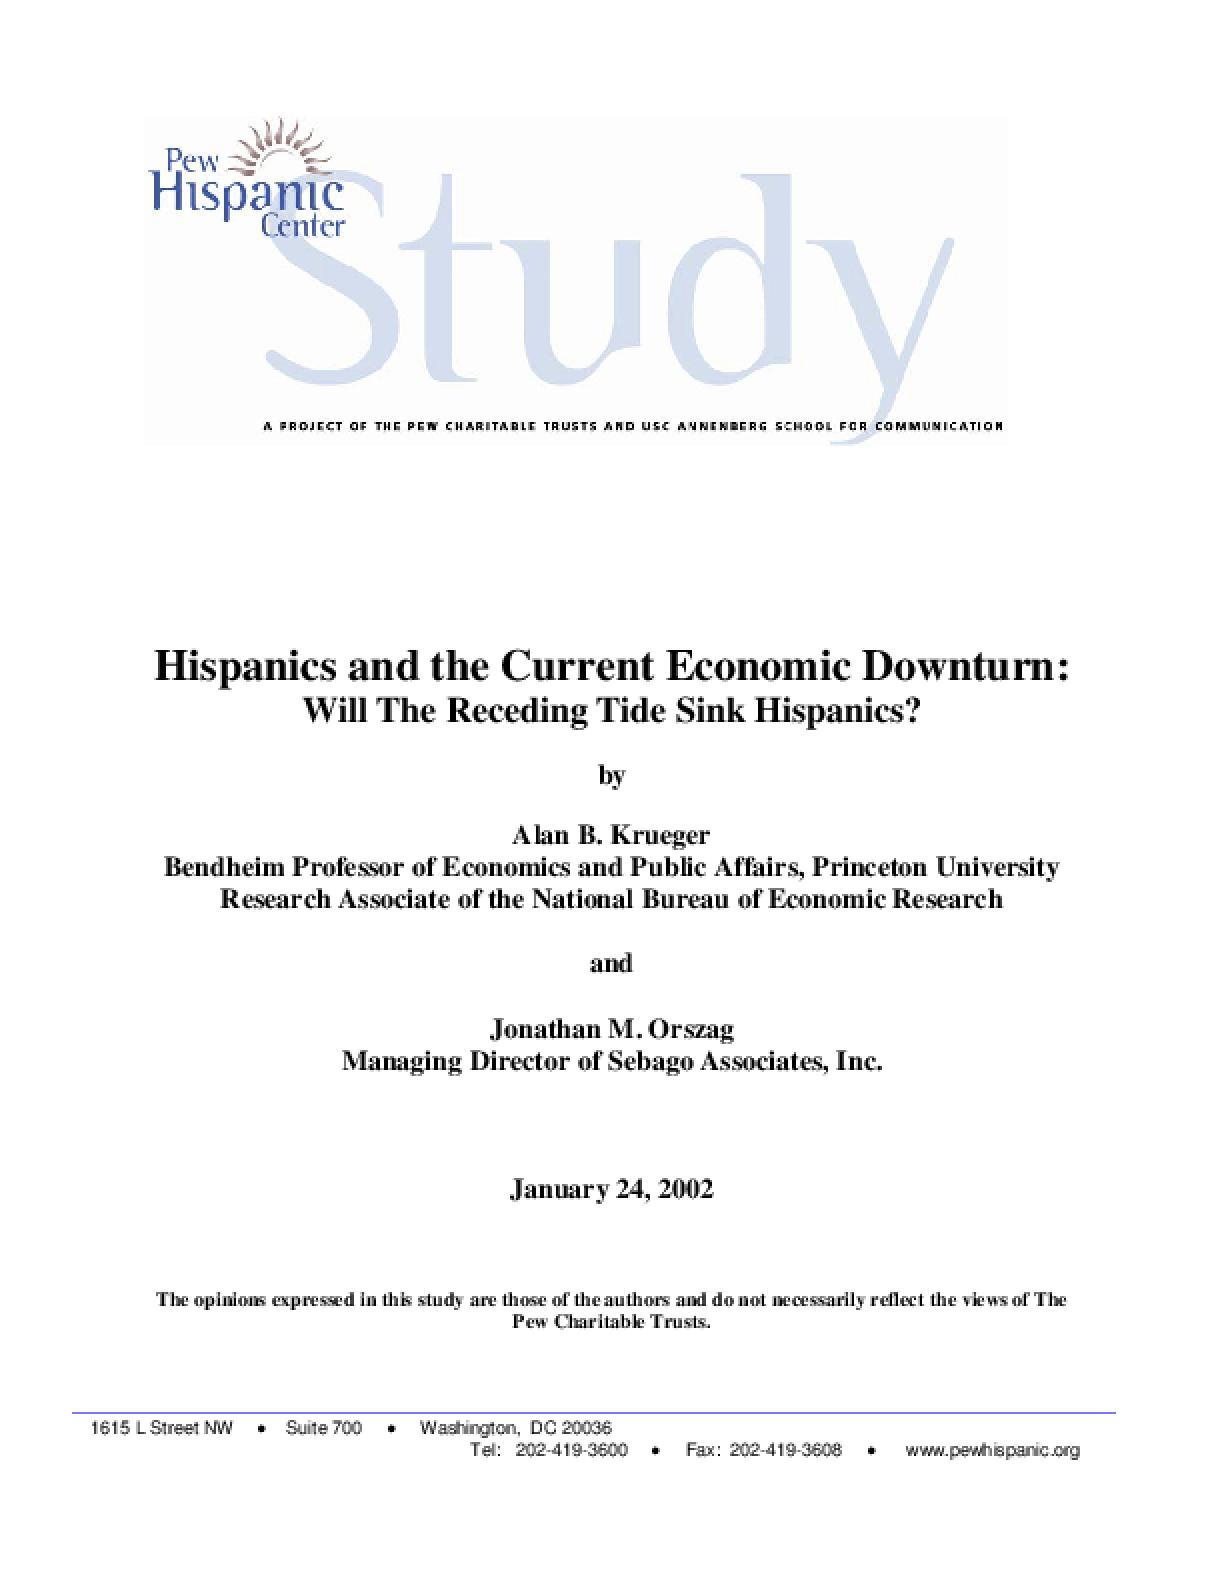 Hispanics and the Current Economic Downturn: Will the Receding Tide Sink Hispanics?